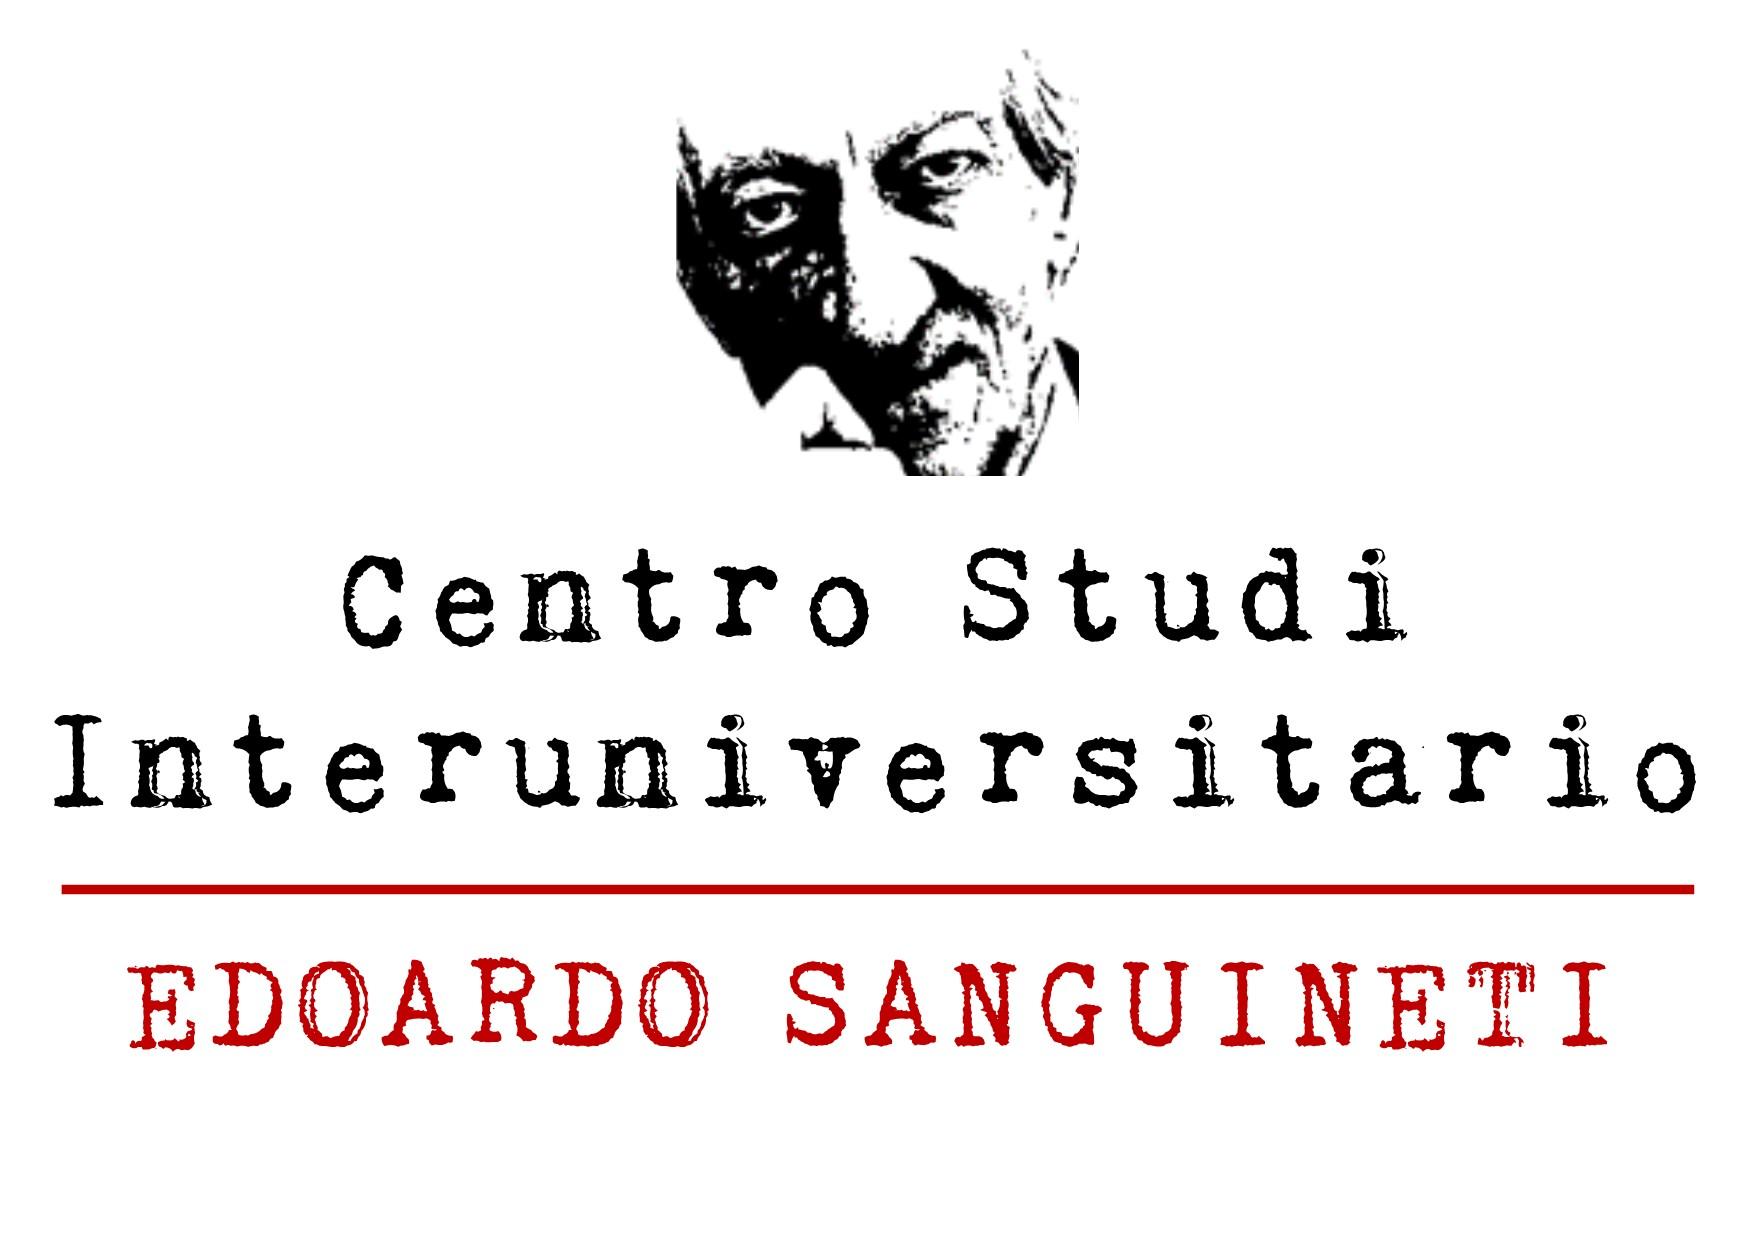 Centro Studi Interuniversitario Edoardo Sanguineti